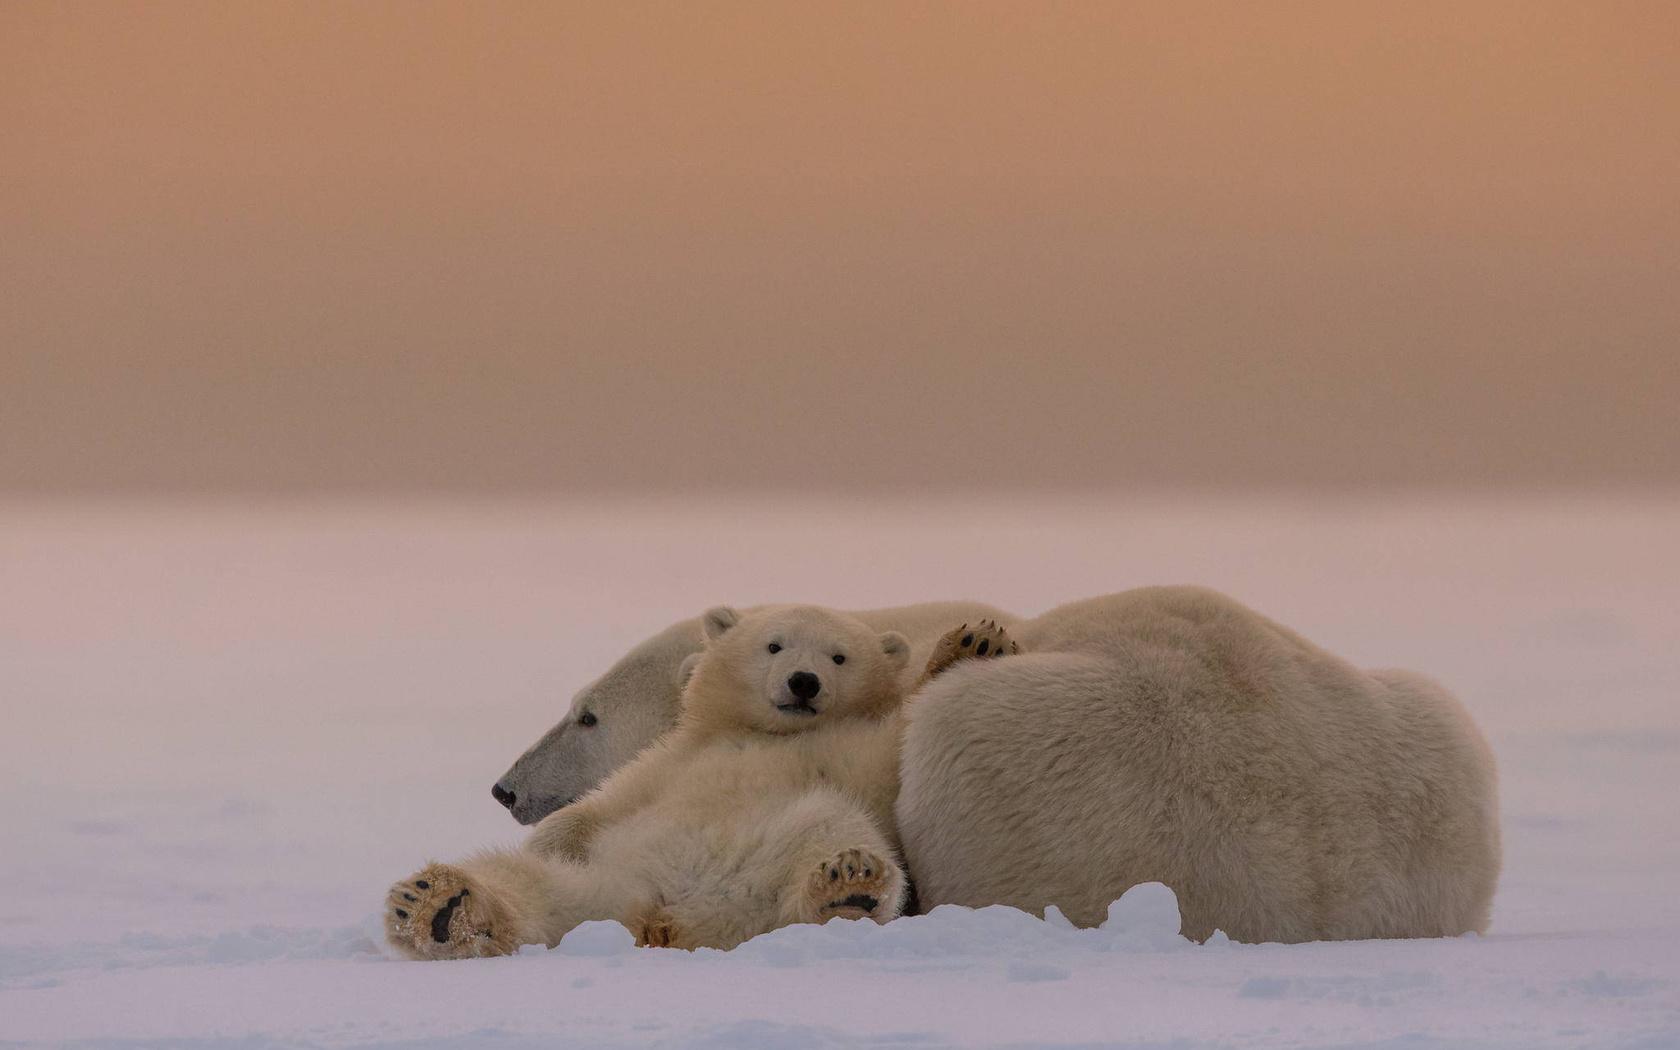 белые медведи, медведица, медвежонок, снег